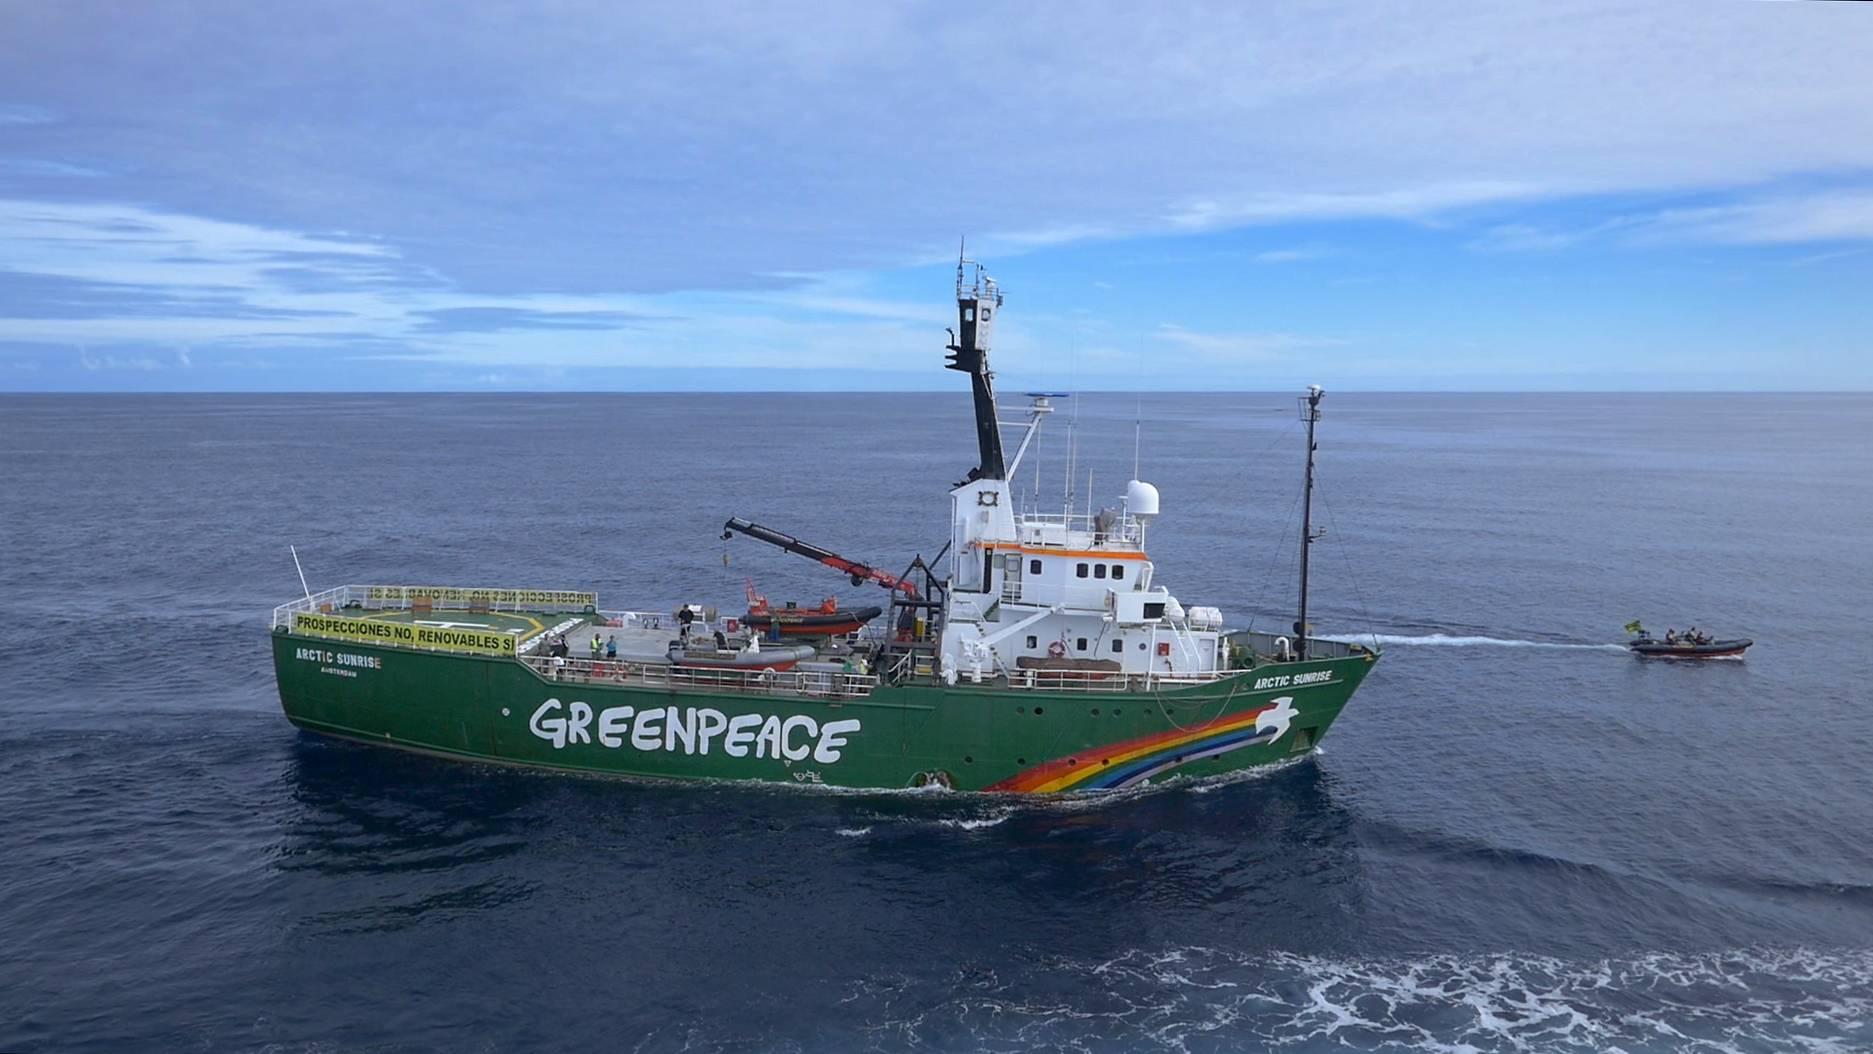 Greenpeace Ship Detained in Spain  Greenpeace Ship...